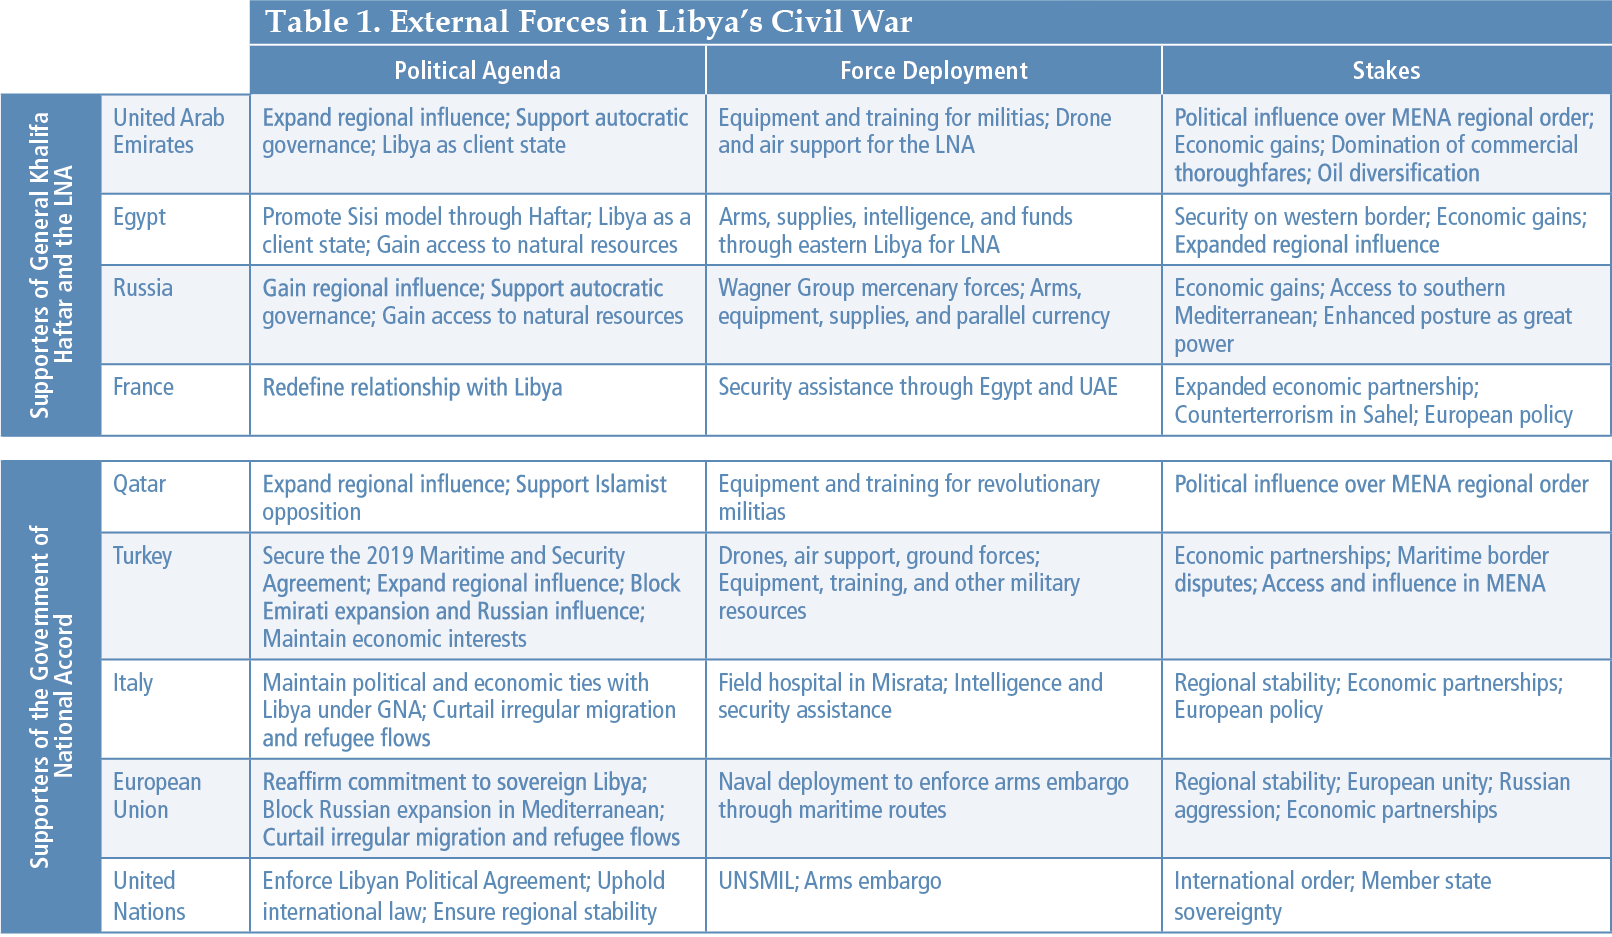 Table 1. External Forces in Libya's Civil War